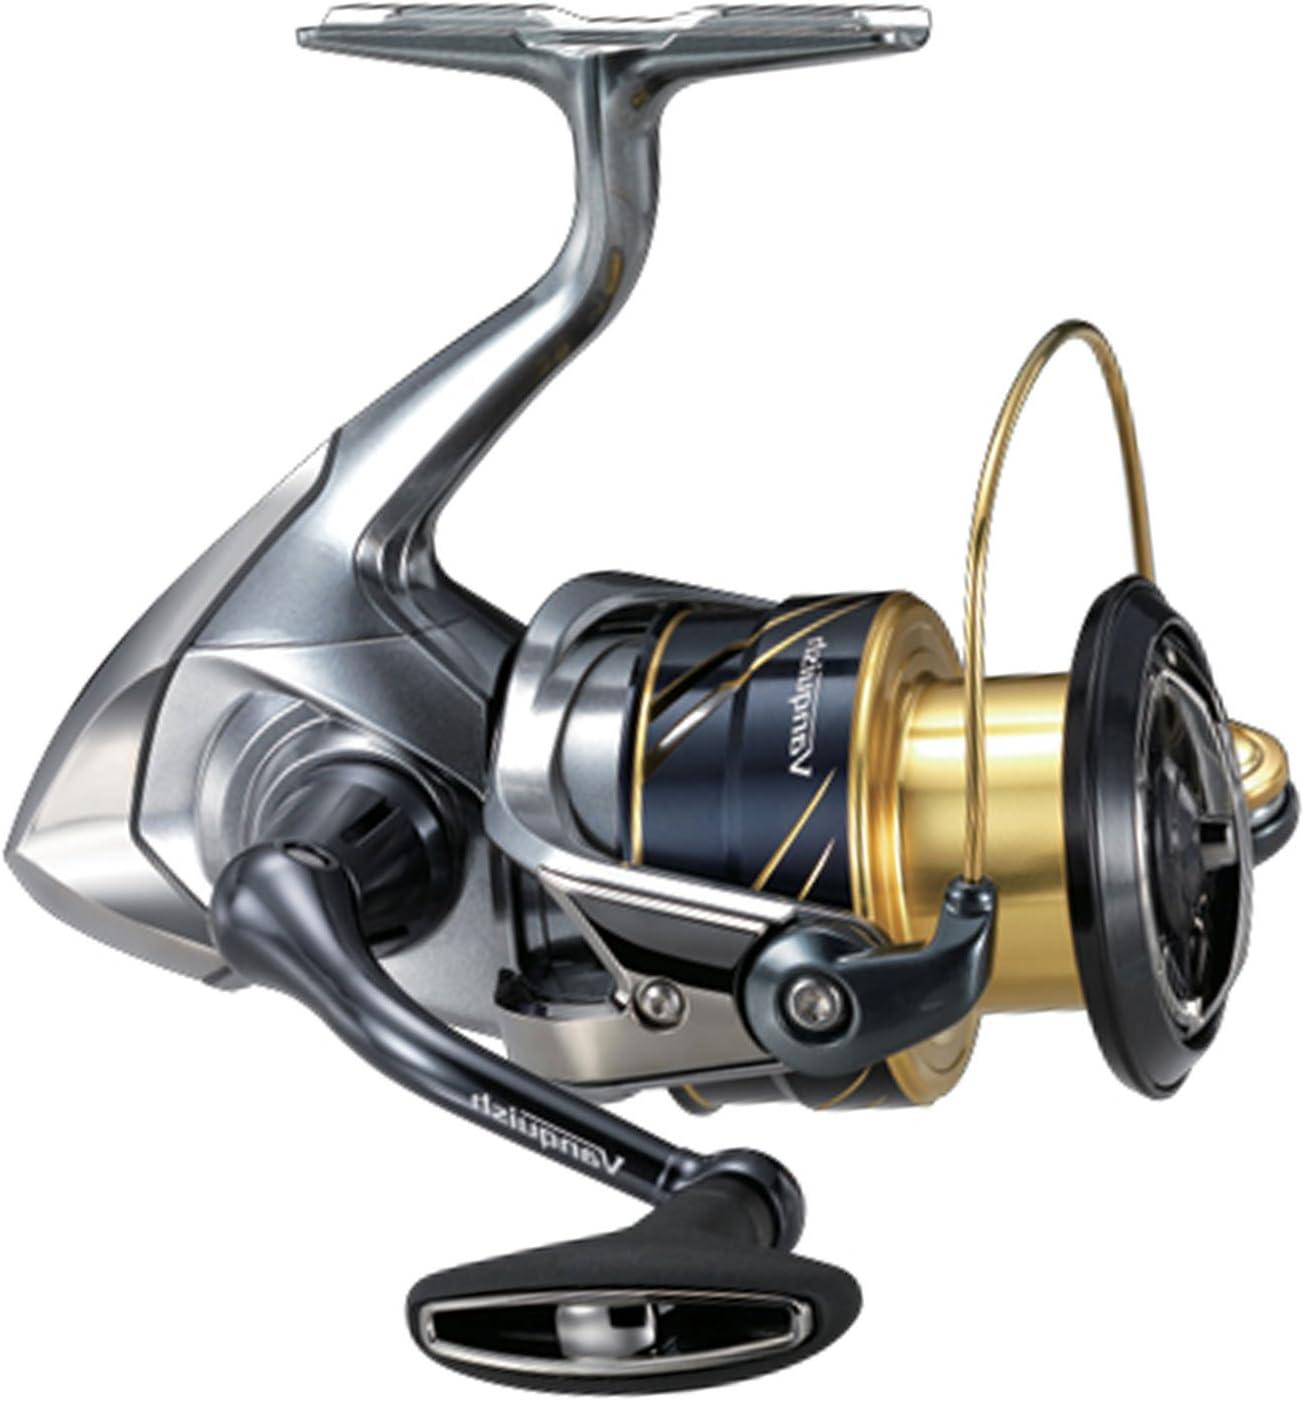 SHIMANO Carretes de Pesca Vanquish 4000 High Gear Spinning ...